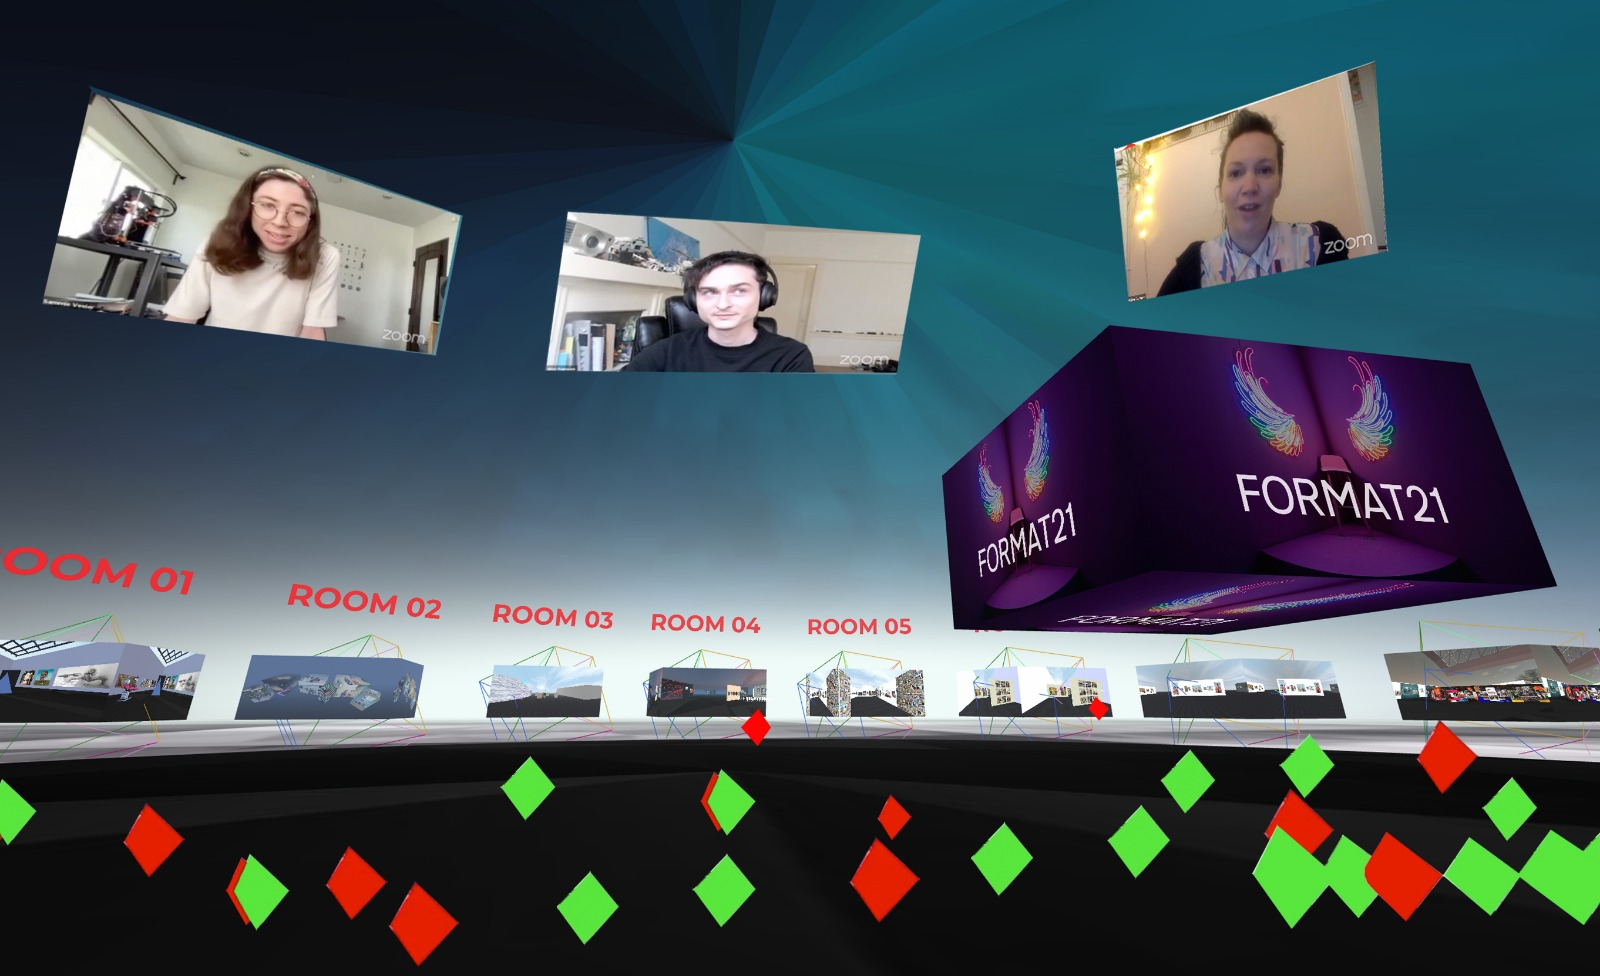 FORMAT21 Online: An insider's view